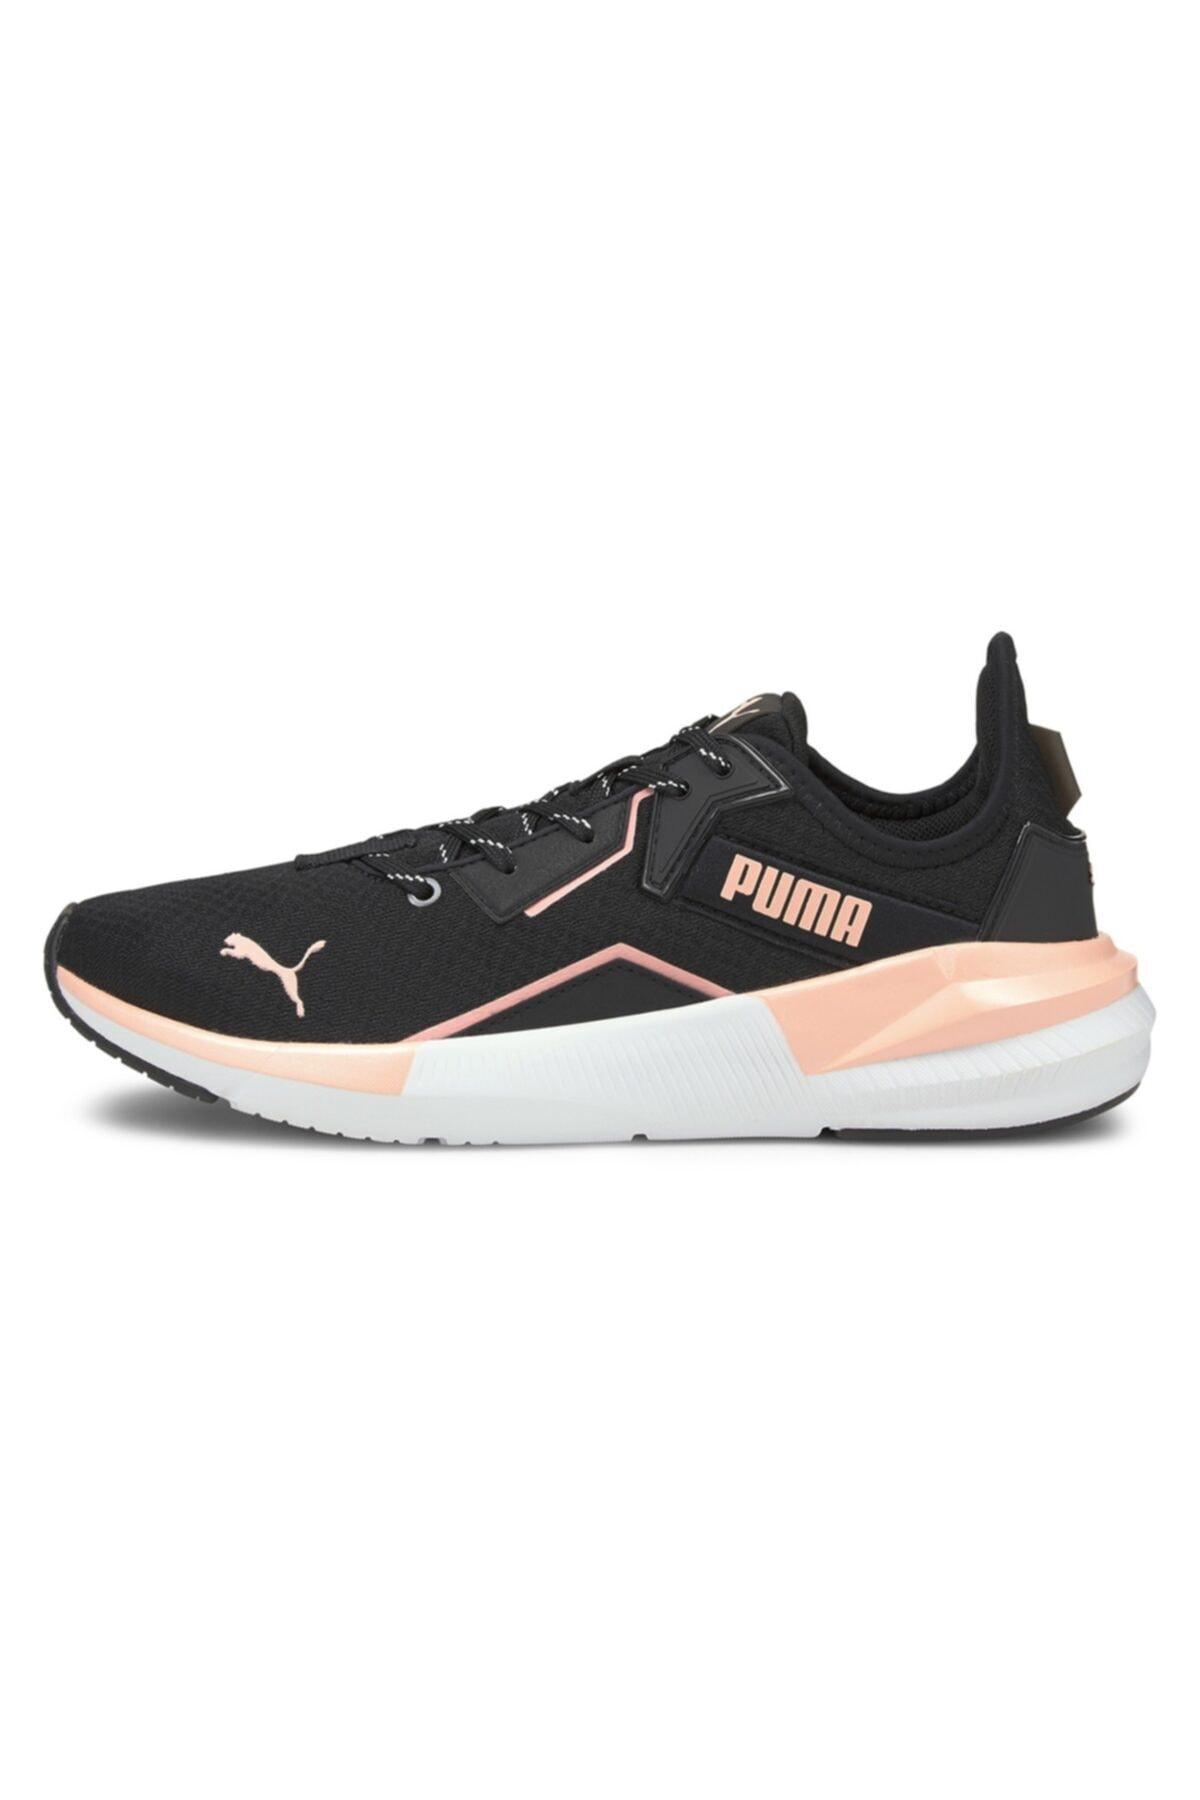 Puma Platinum Metallic Siyah Pembe Garnili Kadın Ayakkabı